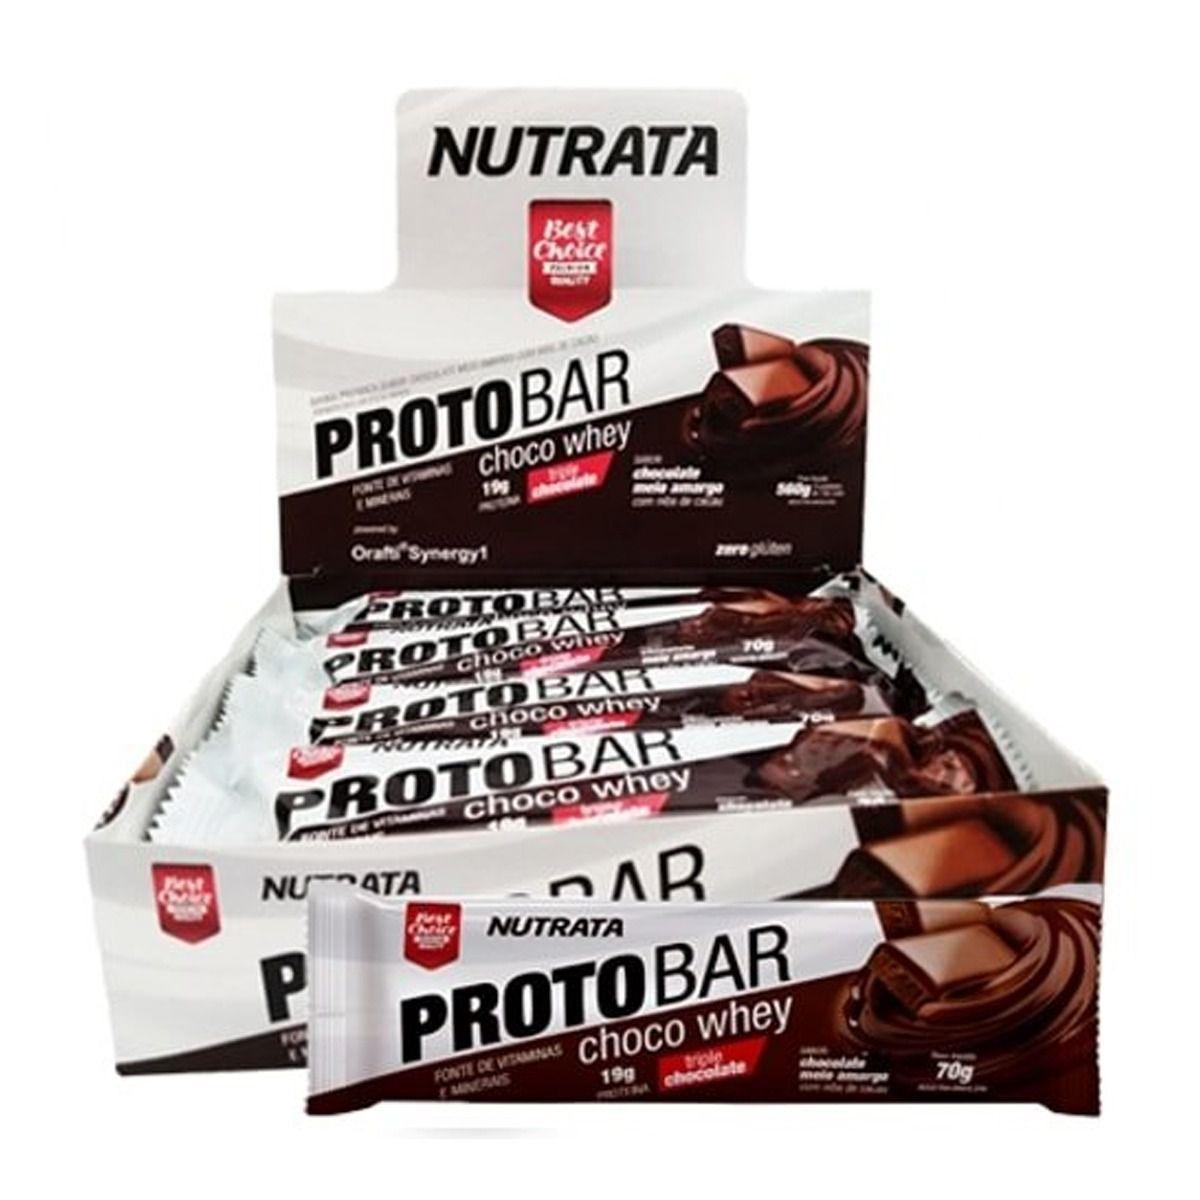 Proto Bar Cx. c/ 8 Barras 70g Nutrata